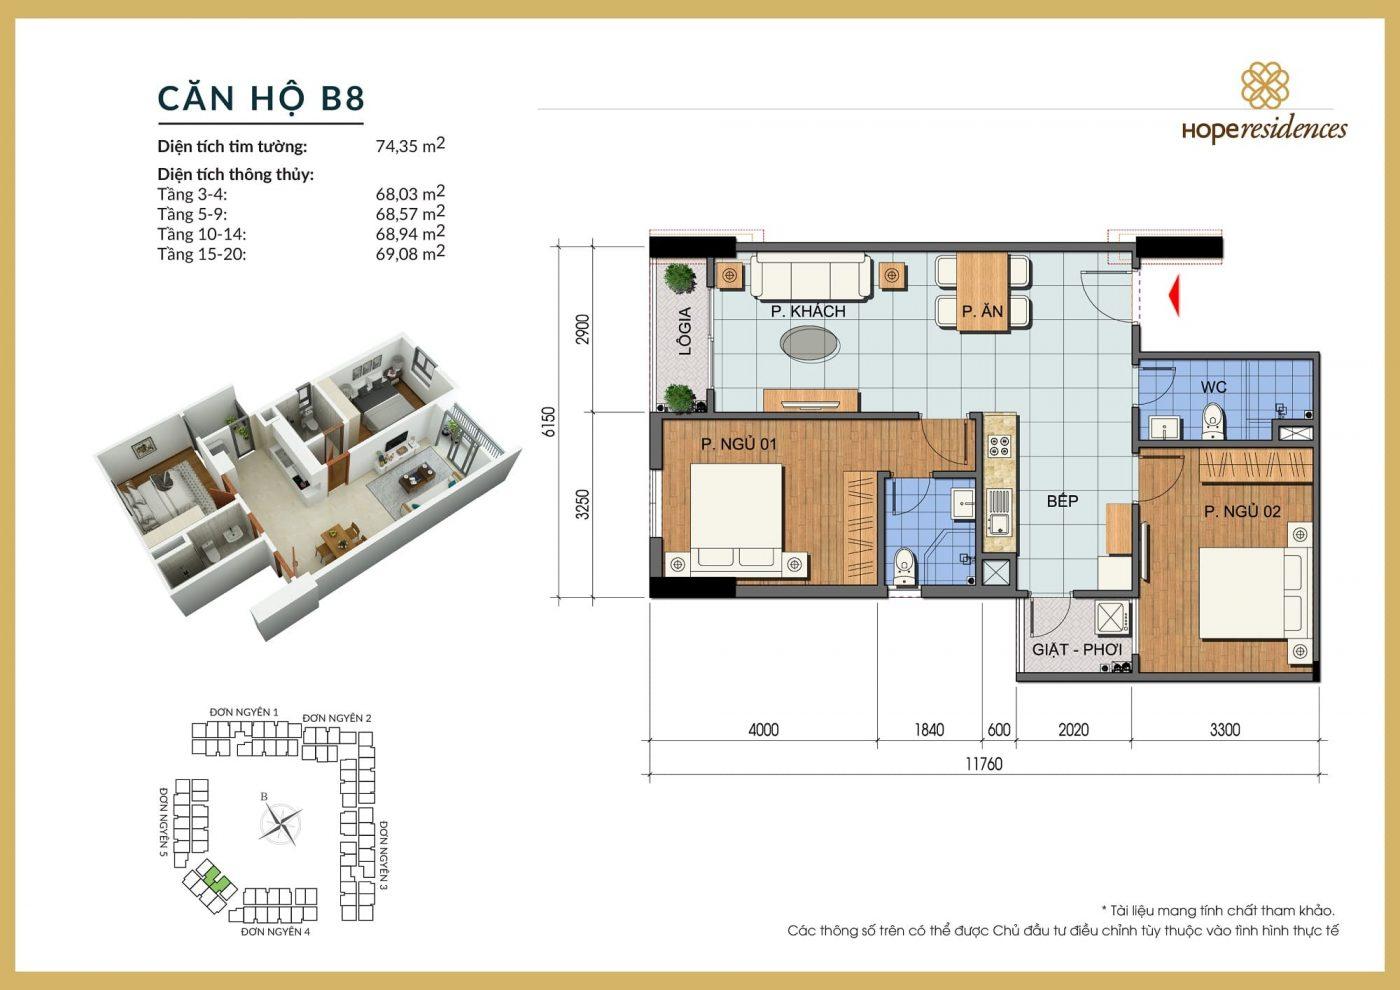 mat bang thiet ke can ho b8 hope residences